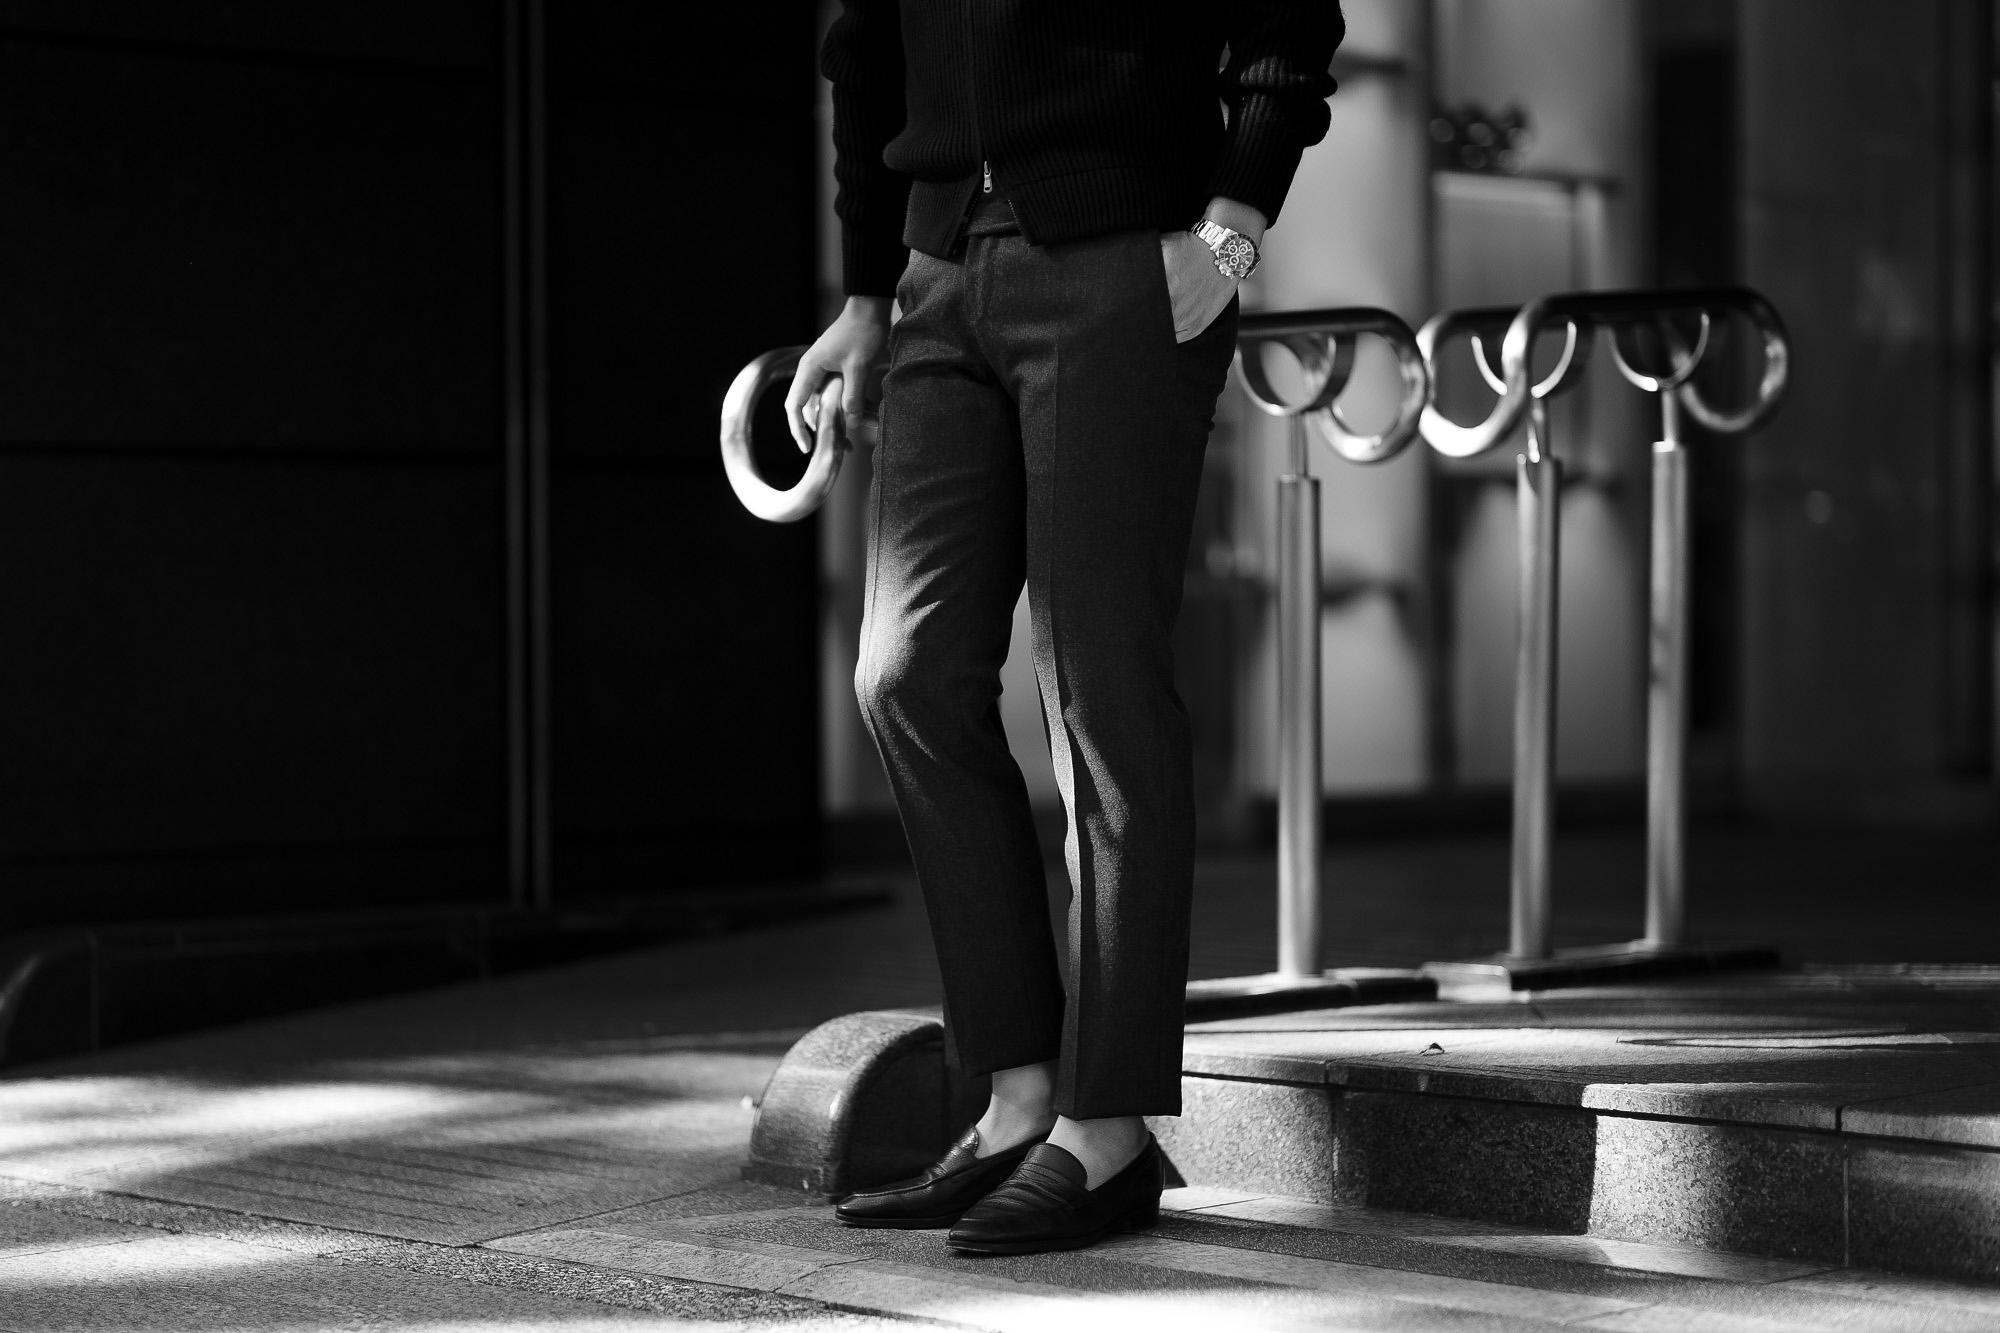 INCOTEX (インコテックス) N35 SLIM FIT (1T0N35) SUPER 100'S WORSTED FLANNEL フランネル ウール スラックス CHARCOAL GRAY (チャコールグレー・930)  2020 秋冬 【ご予約受付中】愛知 名古屋 altoediritto アルトエデリット